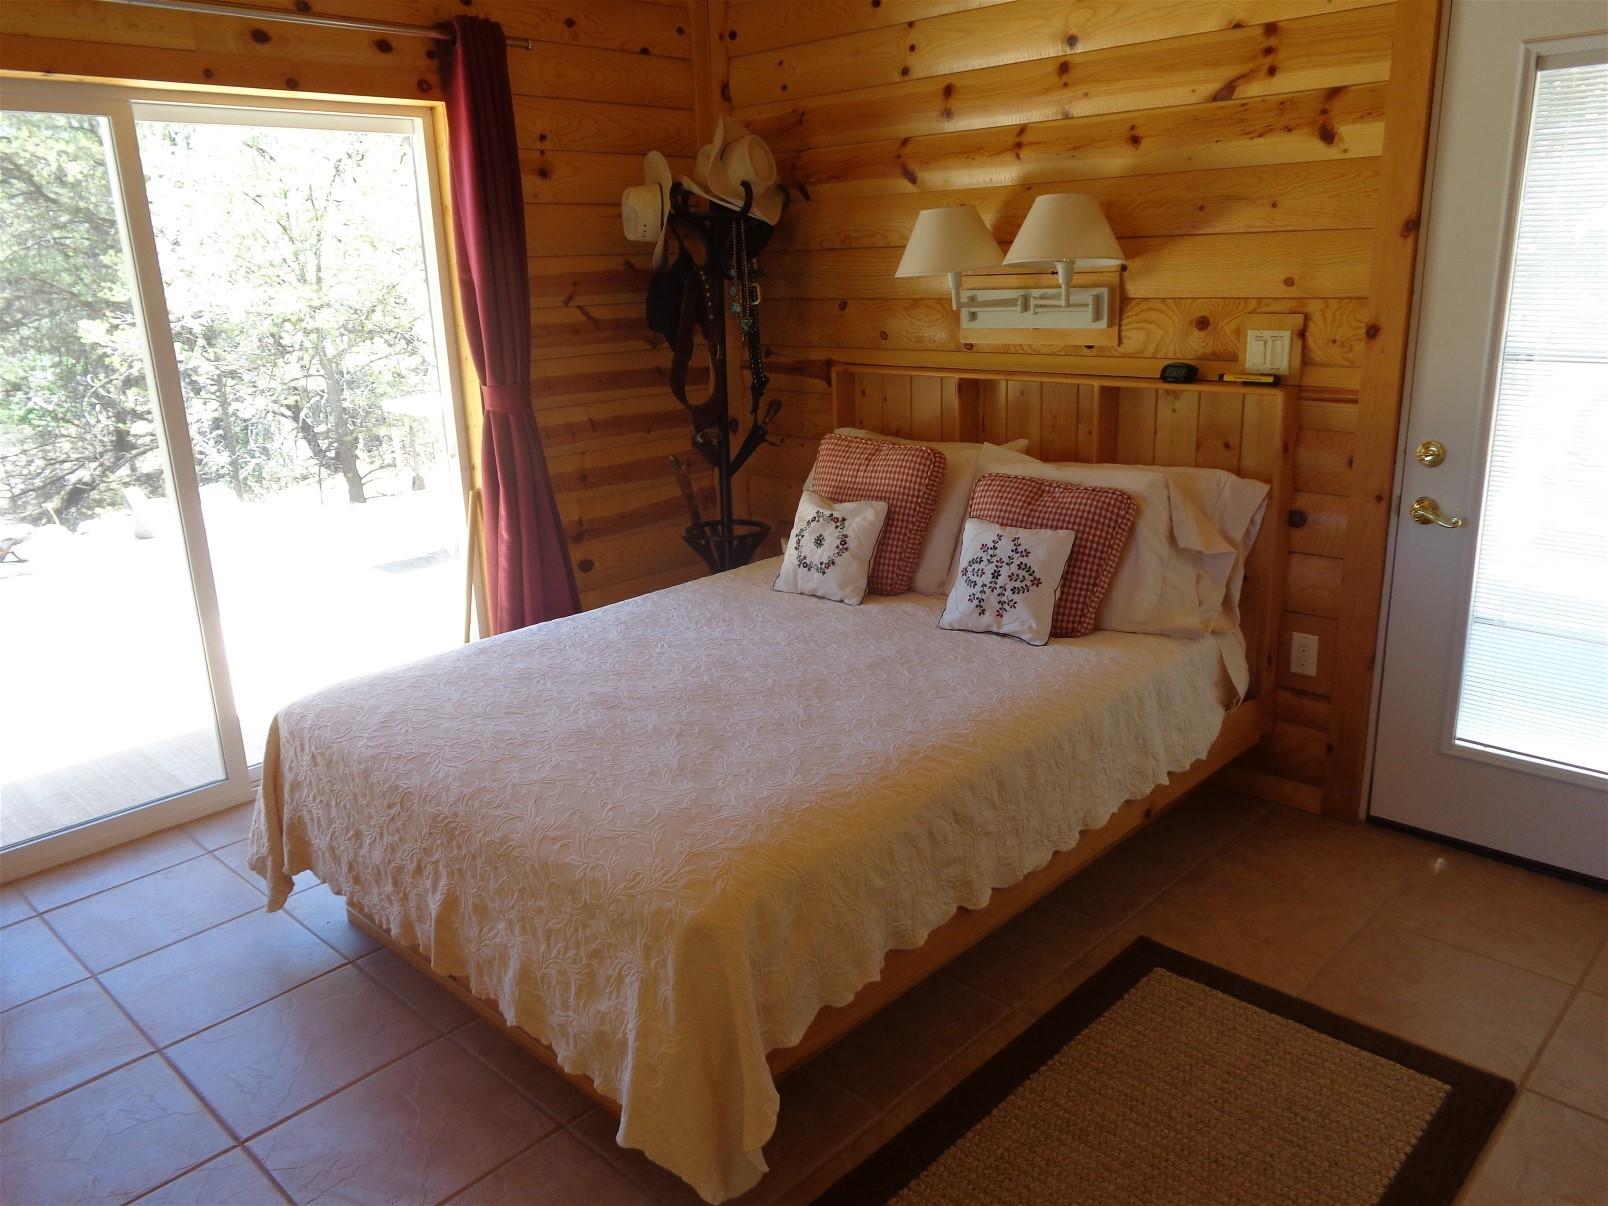 Bedroom in spring/summer